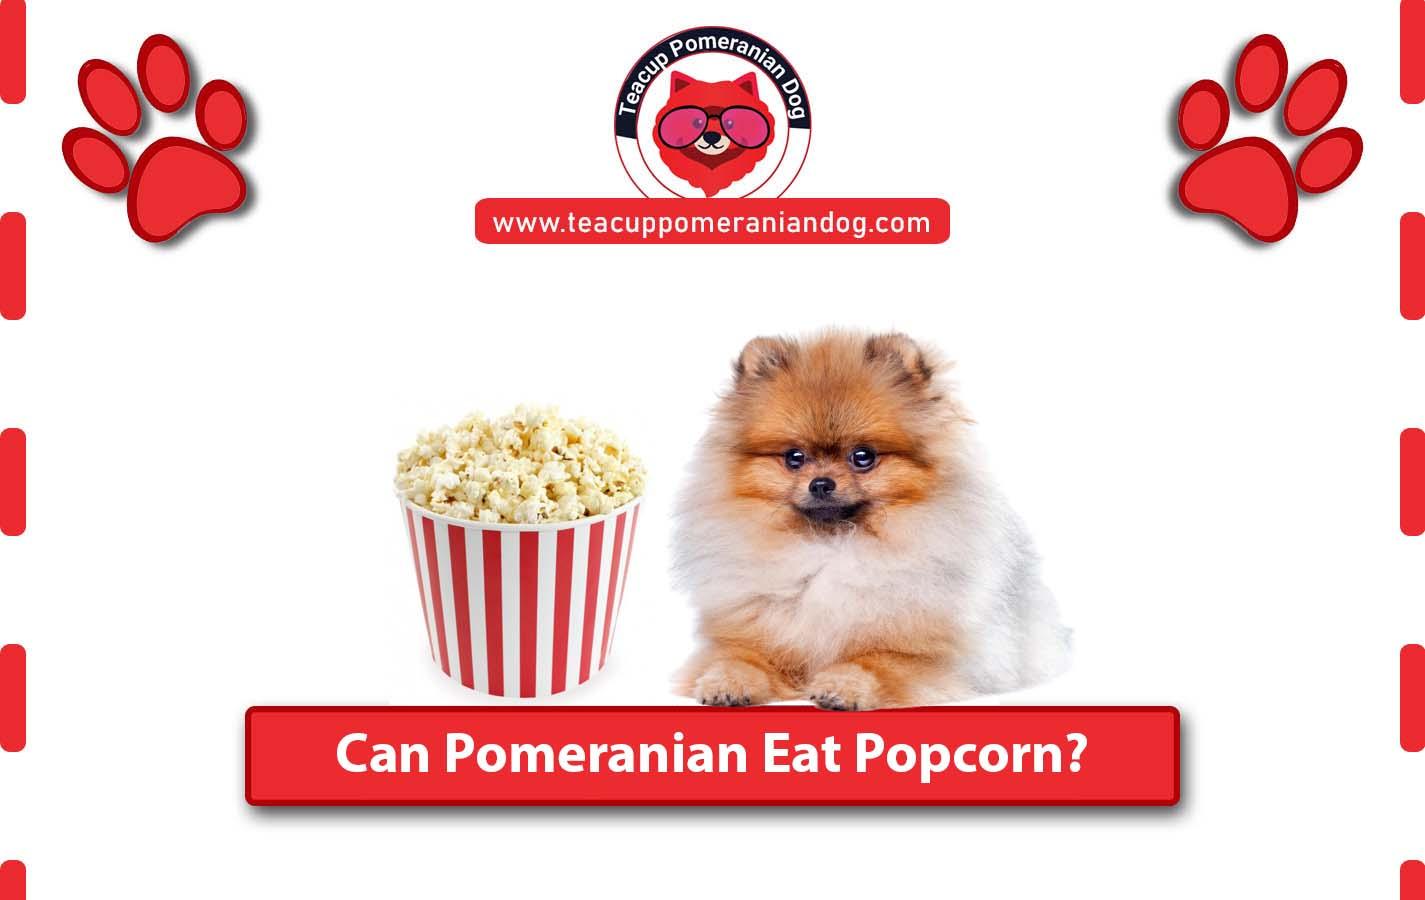 Can Pomeranian Eat Popcorn